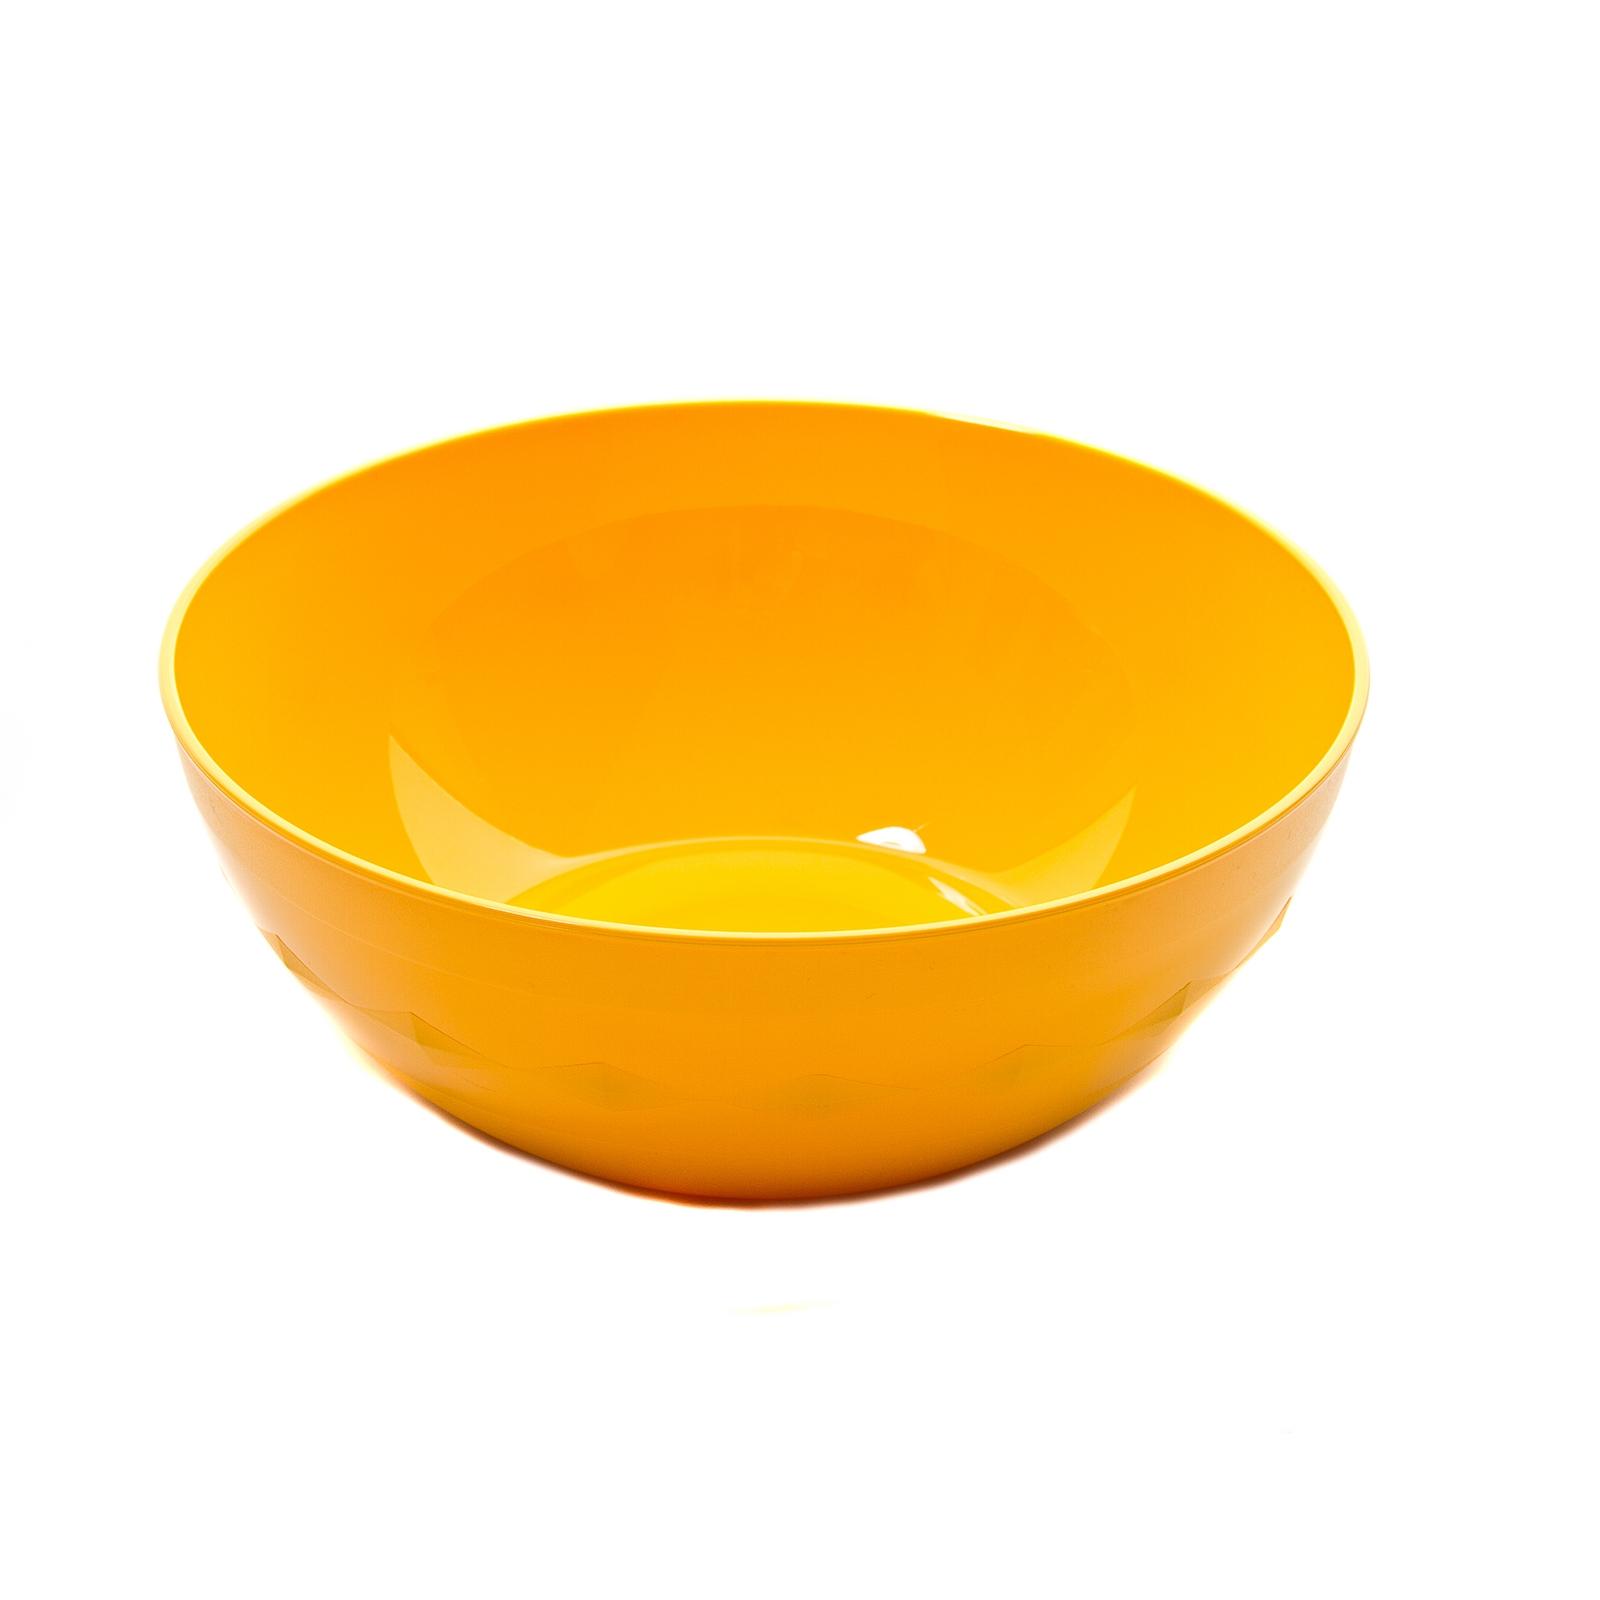 Serving Bowl - Yellow